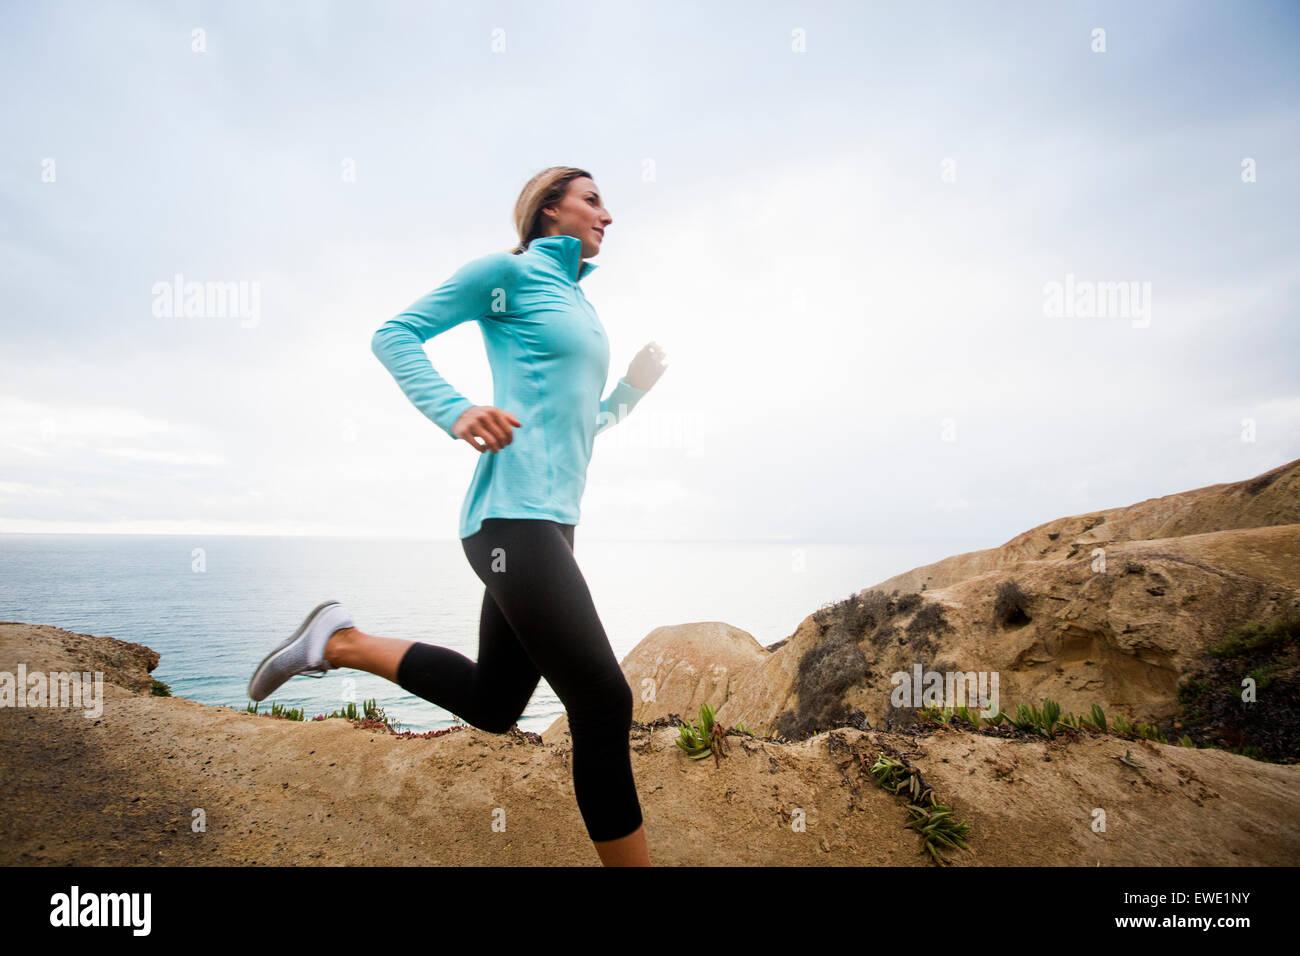 A young woman jogging along the coastal cliffs usa - Stock Image